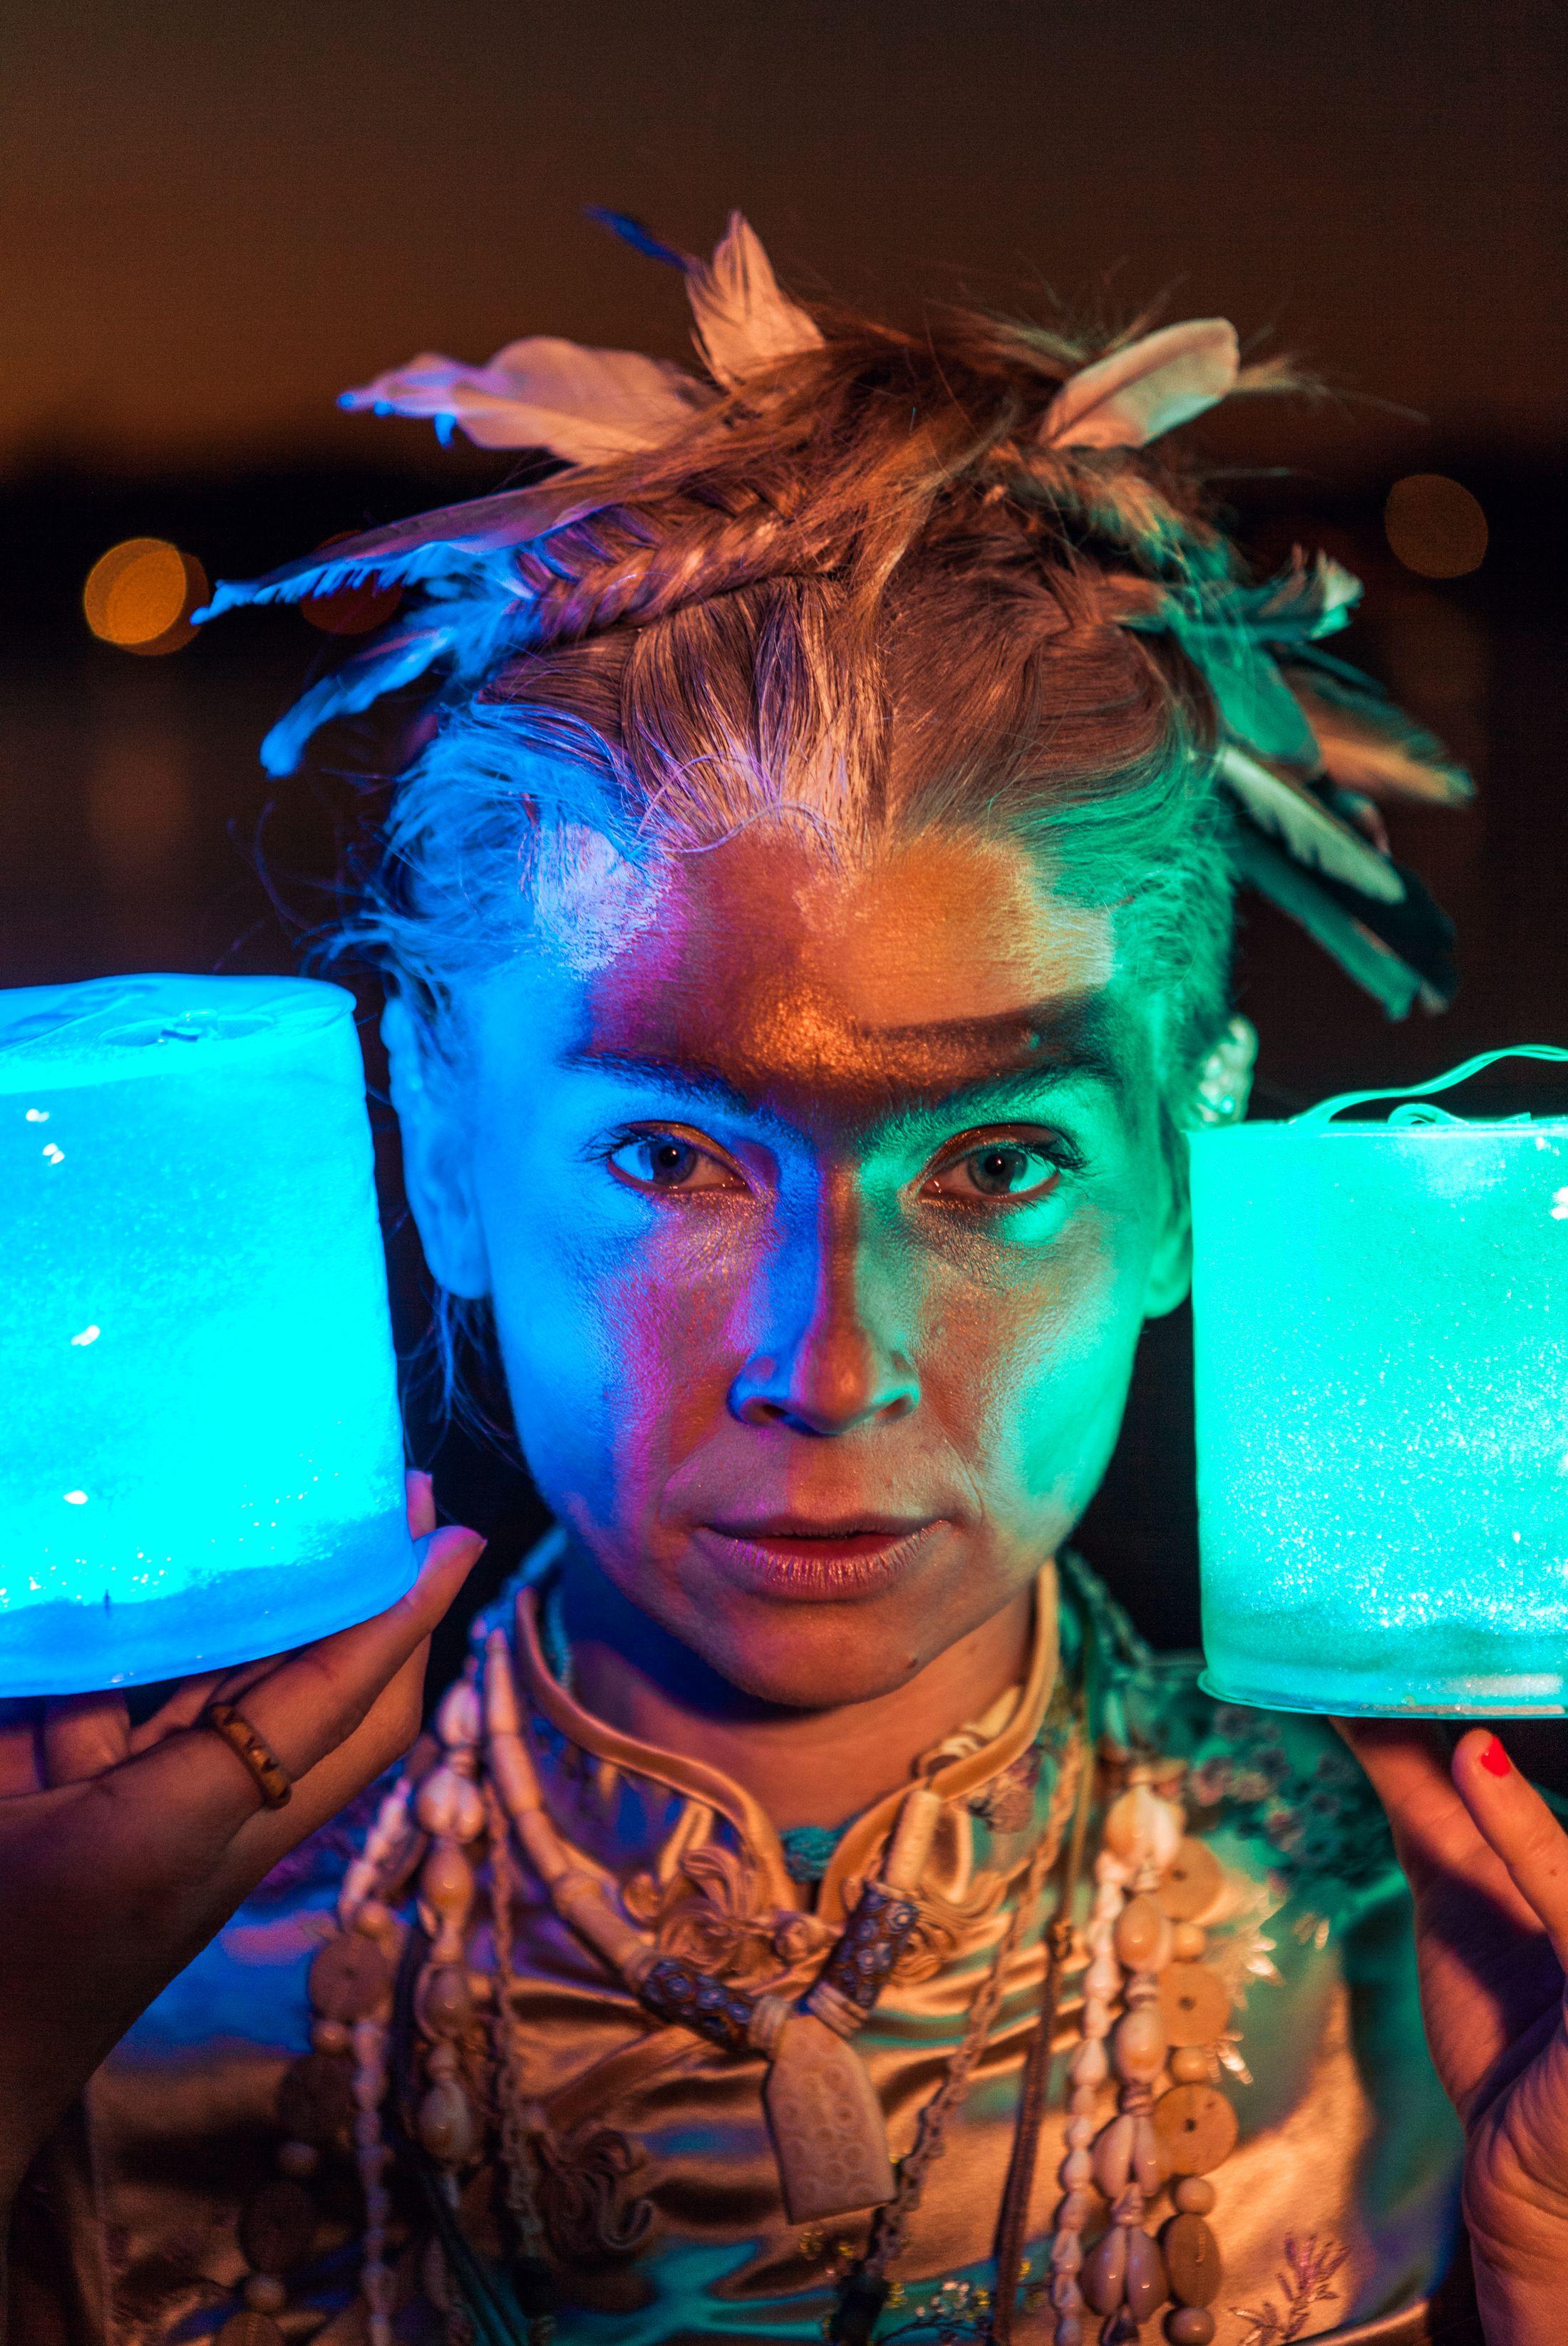 Electric Forest yoga LED light nomad festival style ethnic global fashion shoot warpaint tribal 12.jpg